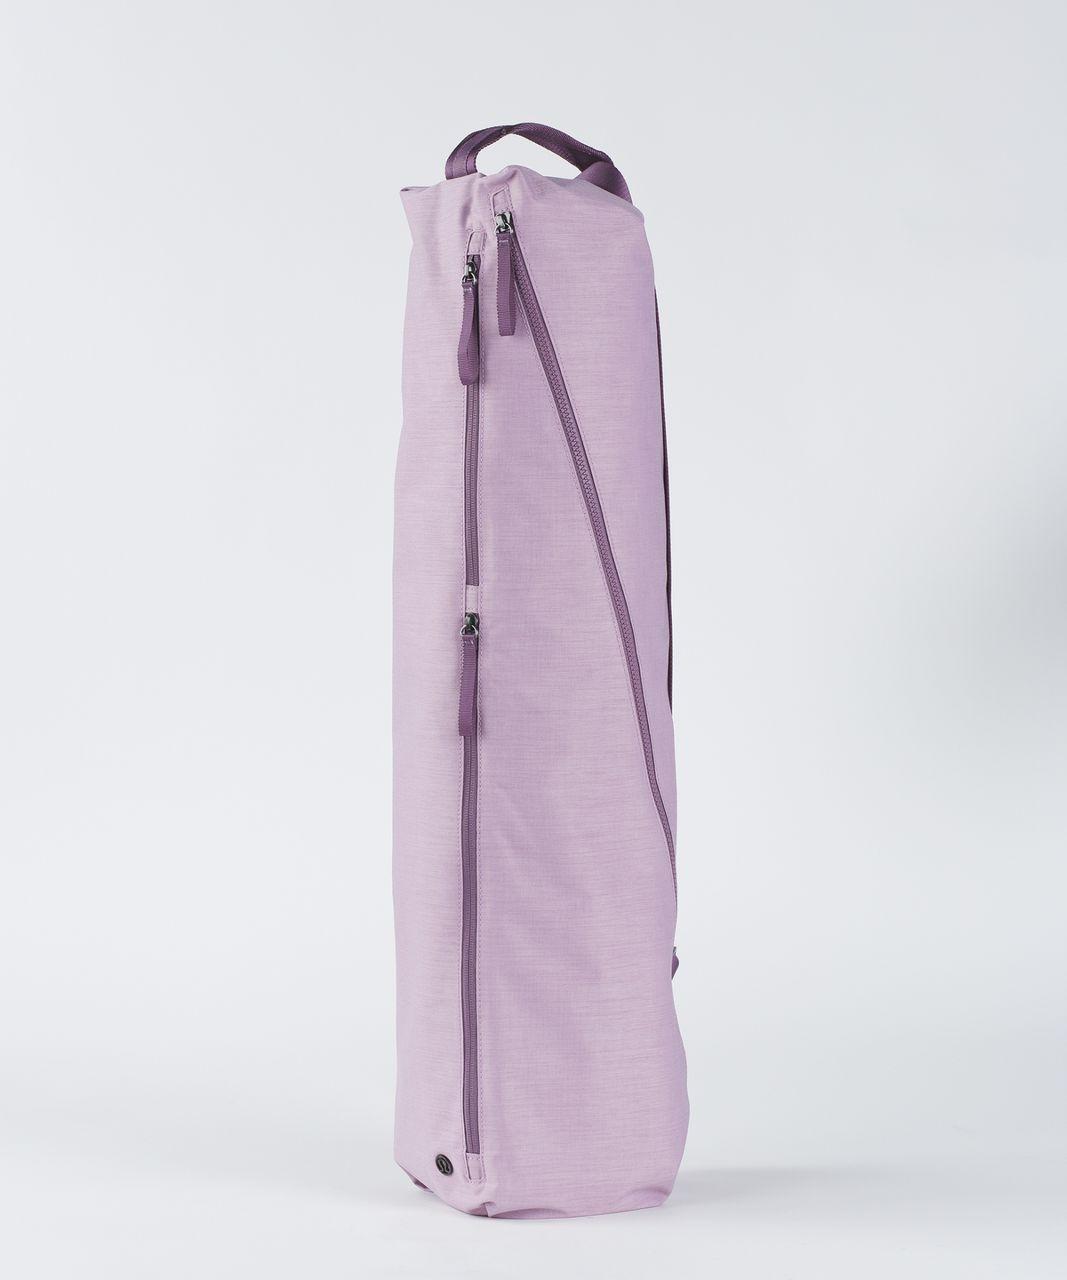 Lululemon The Yoga Bag Rose Blush